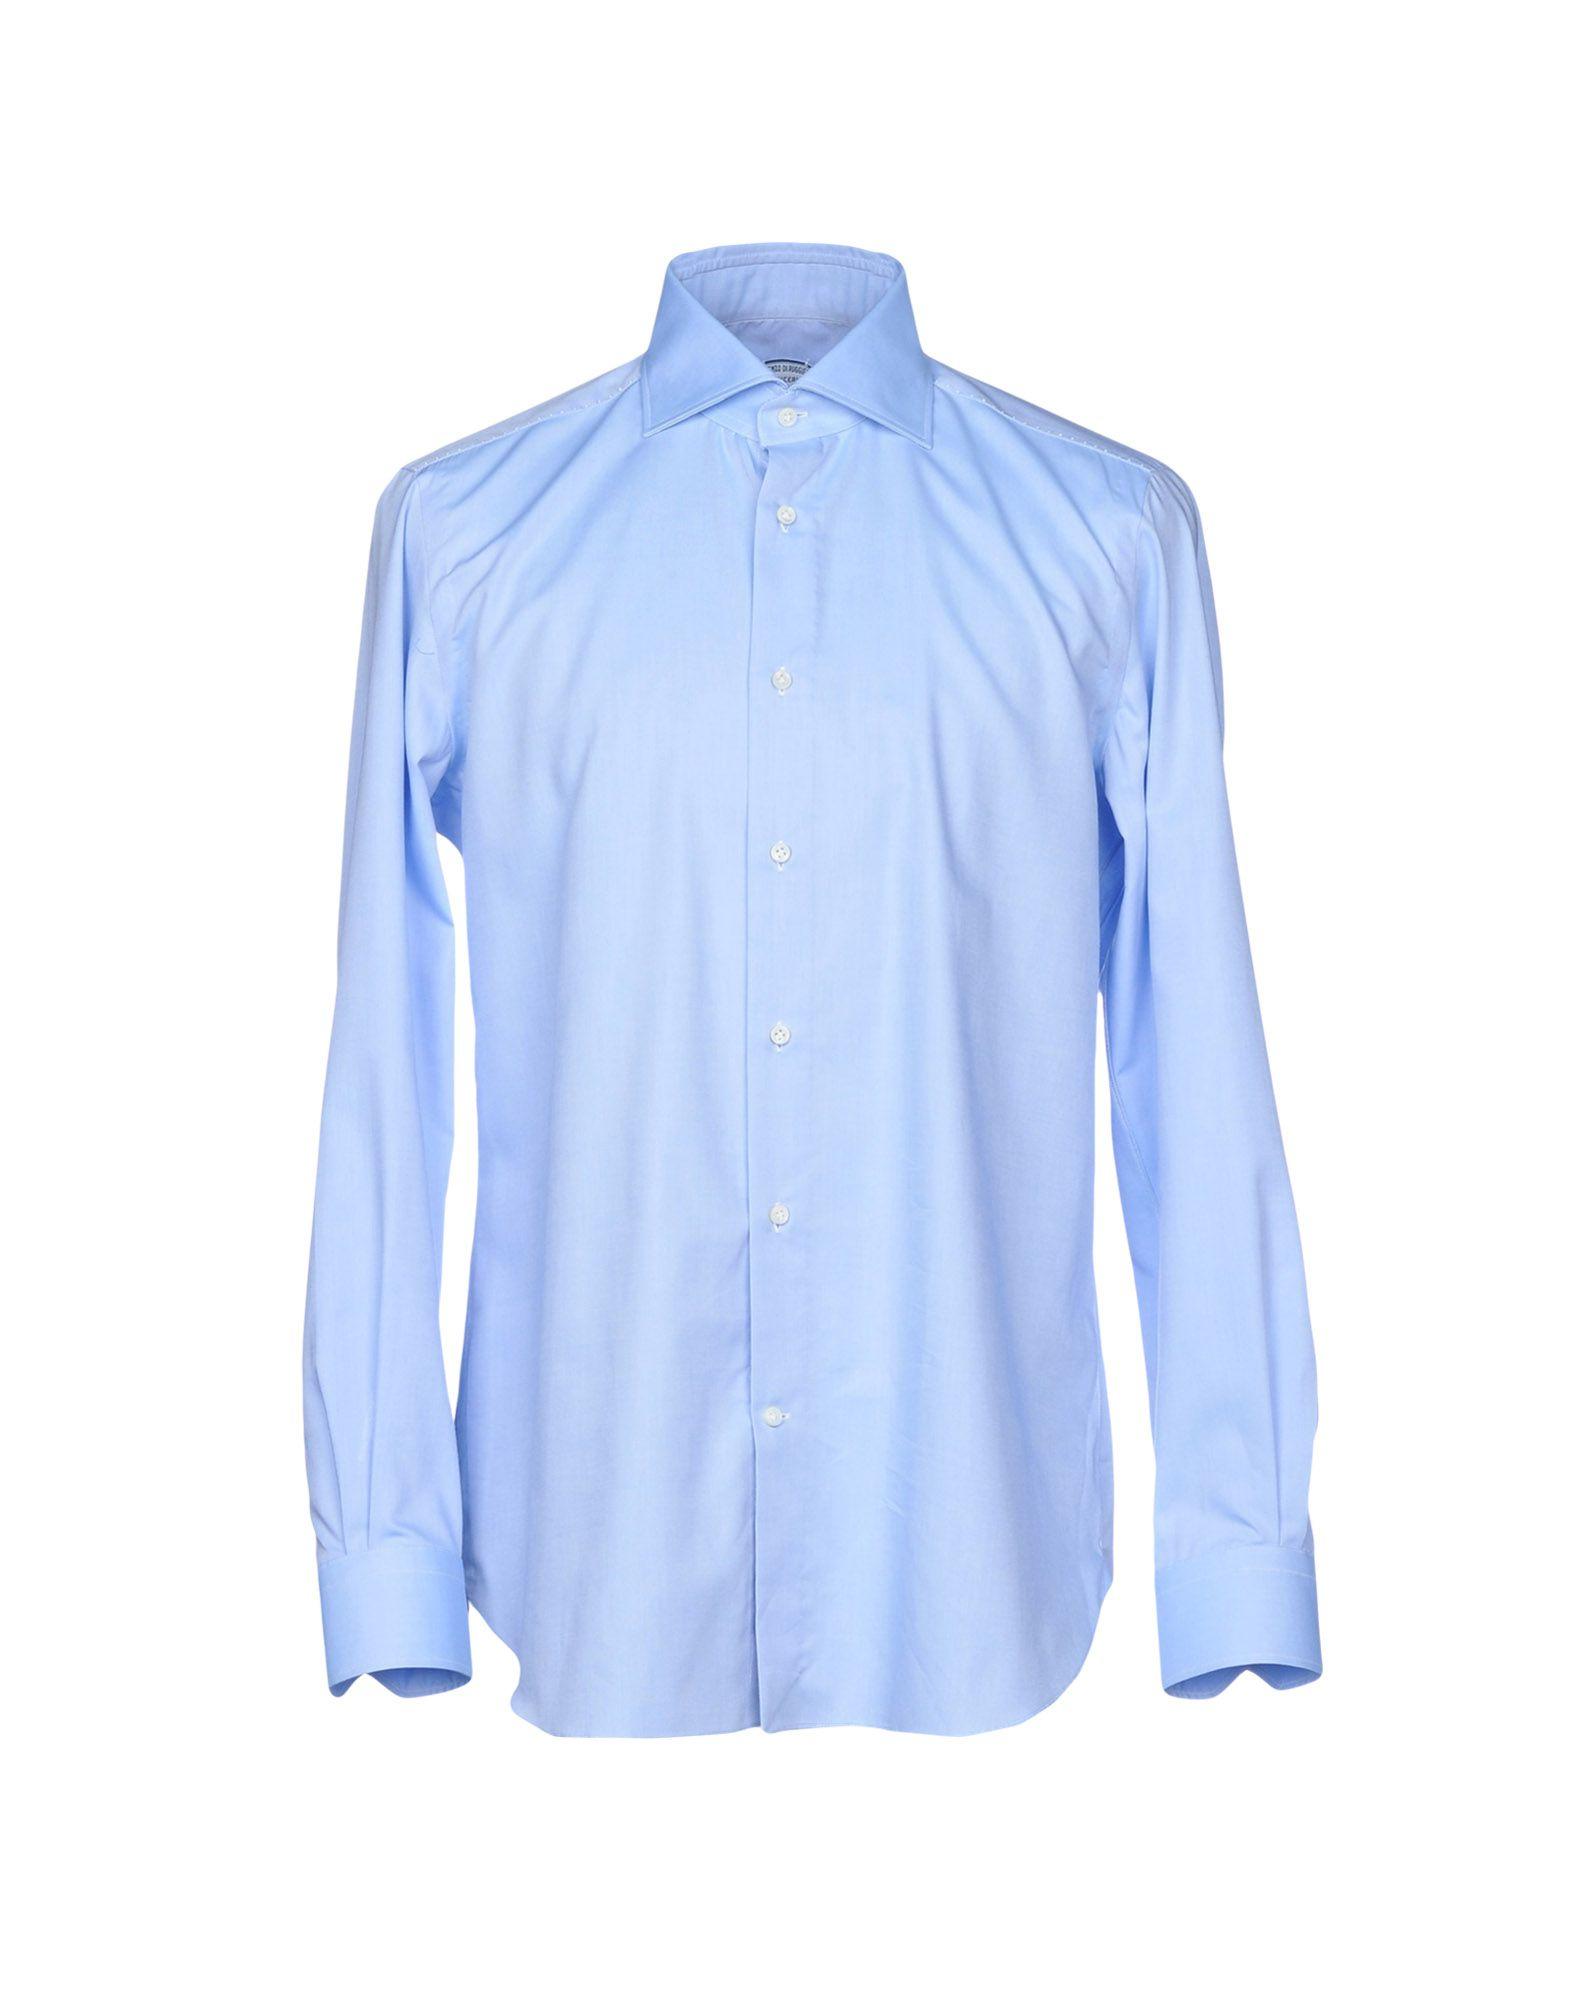 цена CAMICERIA VINCENZO DI RUGGIERO Pубашка в интернет-магазинах